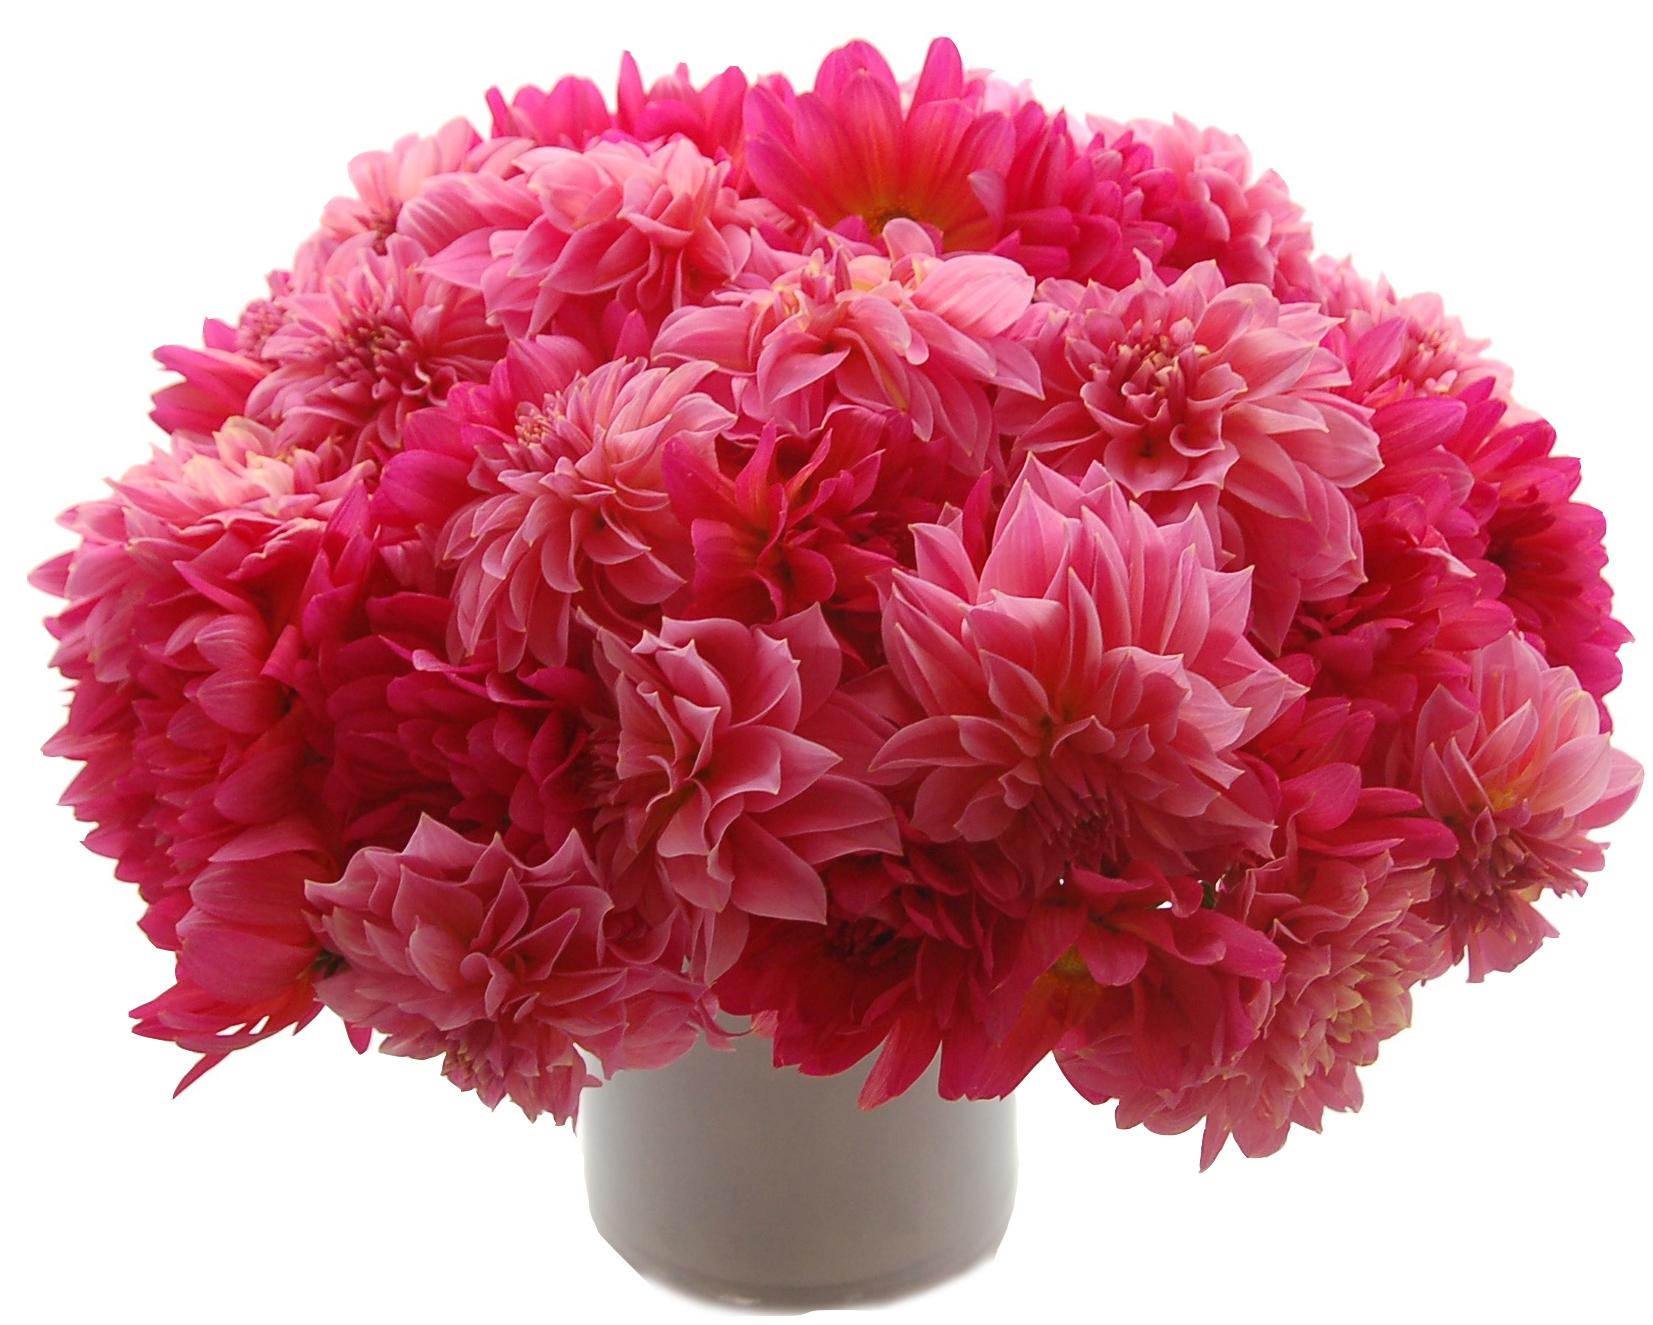 Hot Pink Dahlias start at $225